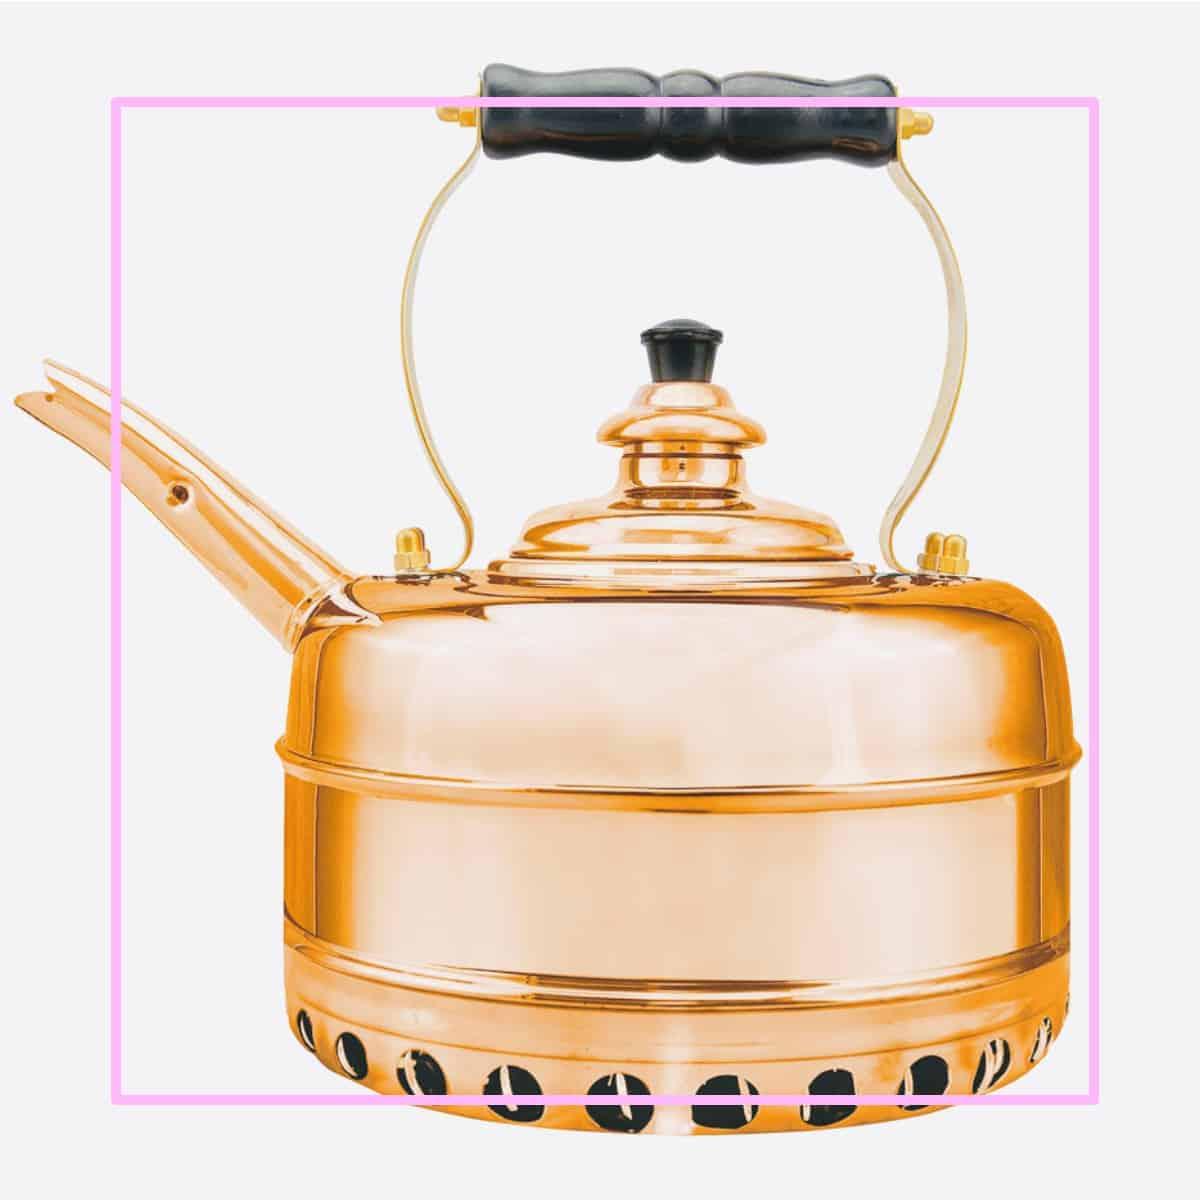 Richmond kettles heritage No3 pink frame instagram 1 sales